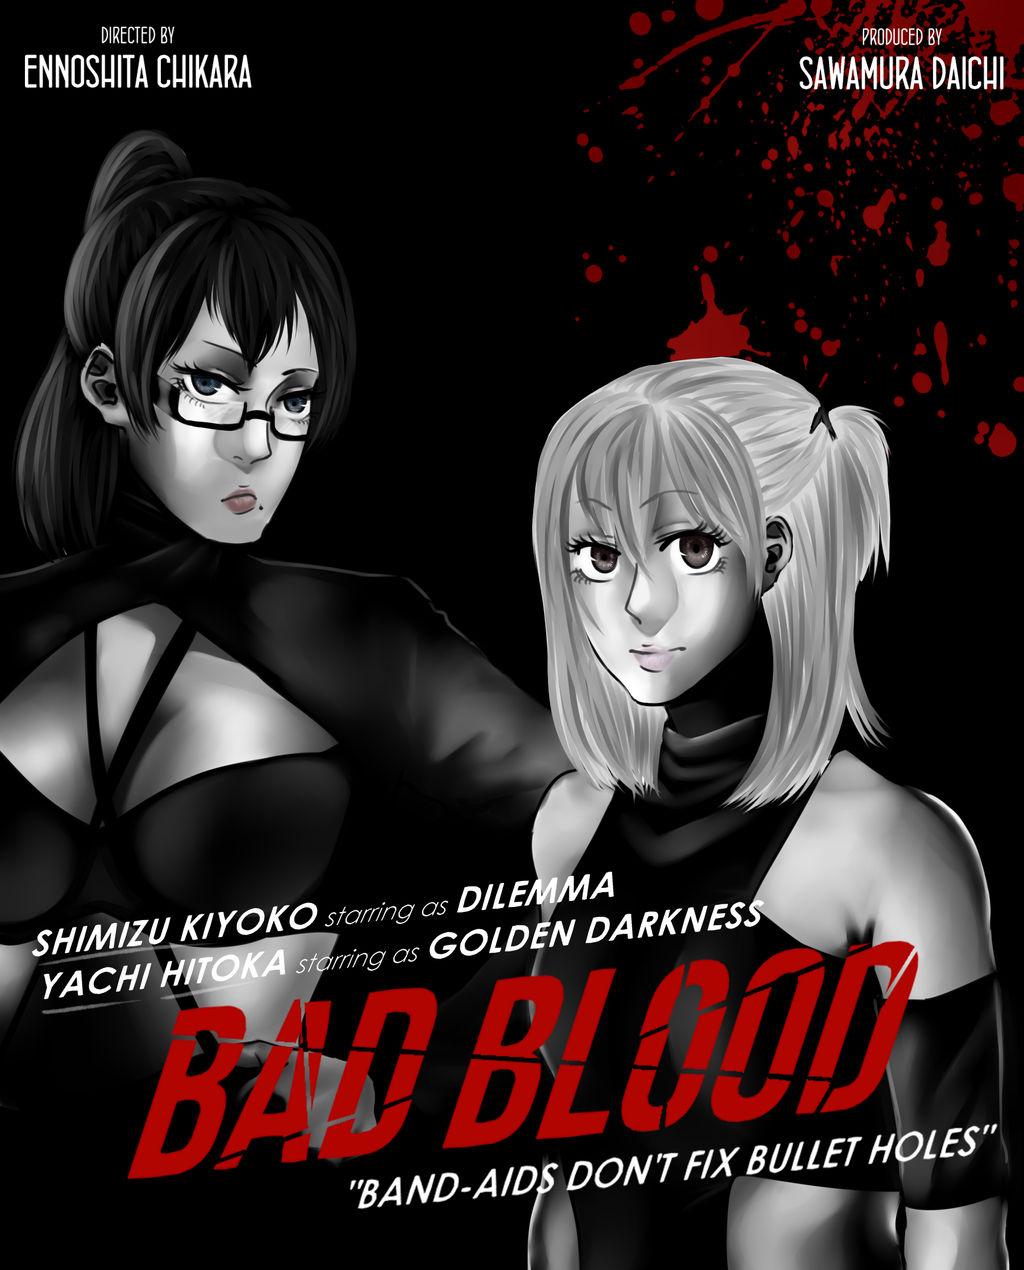 Bad Blood - Shimizu Kiyoko and Yachi Hitoka by Equestrian